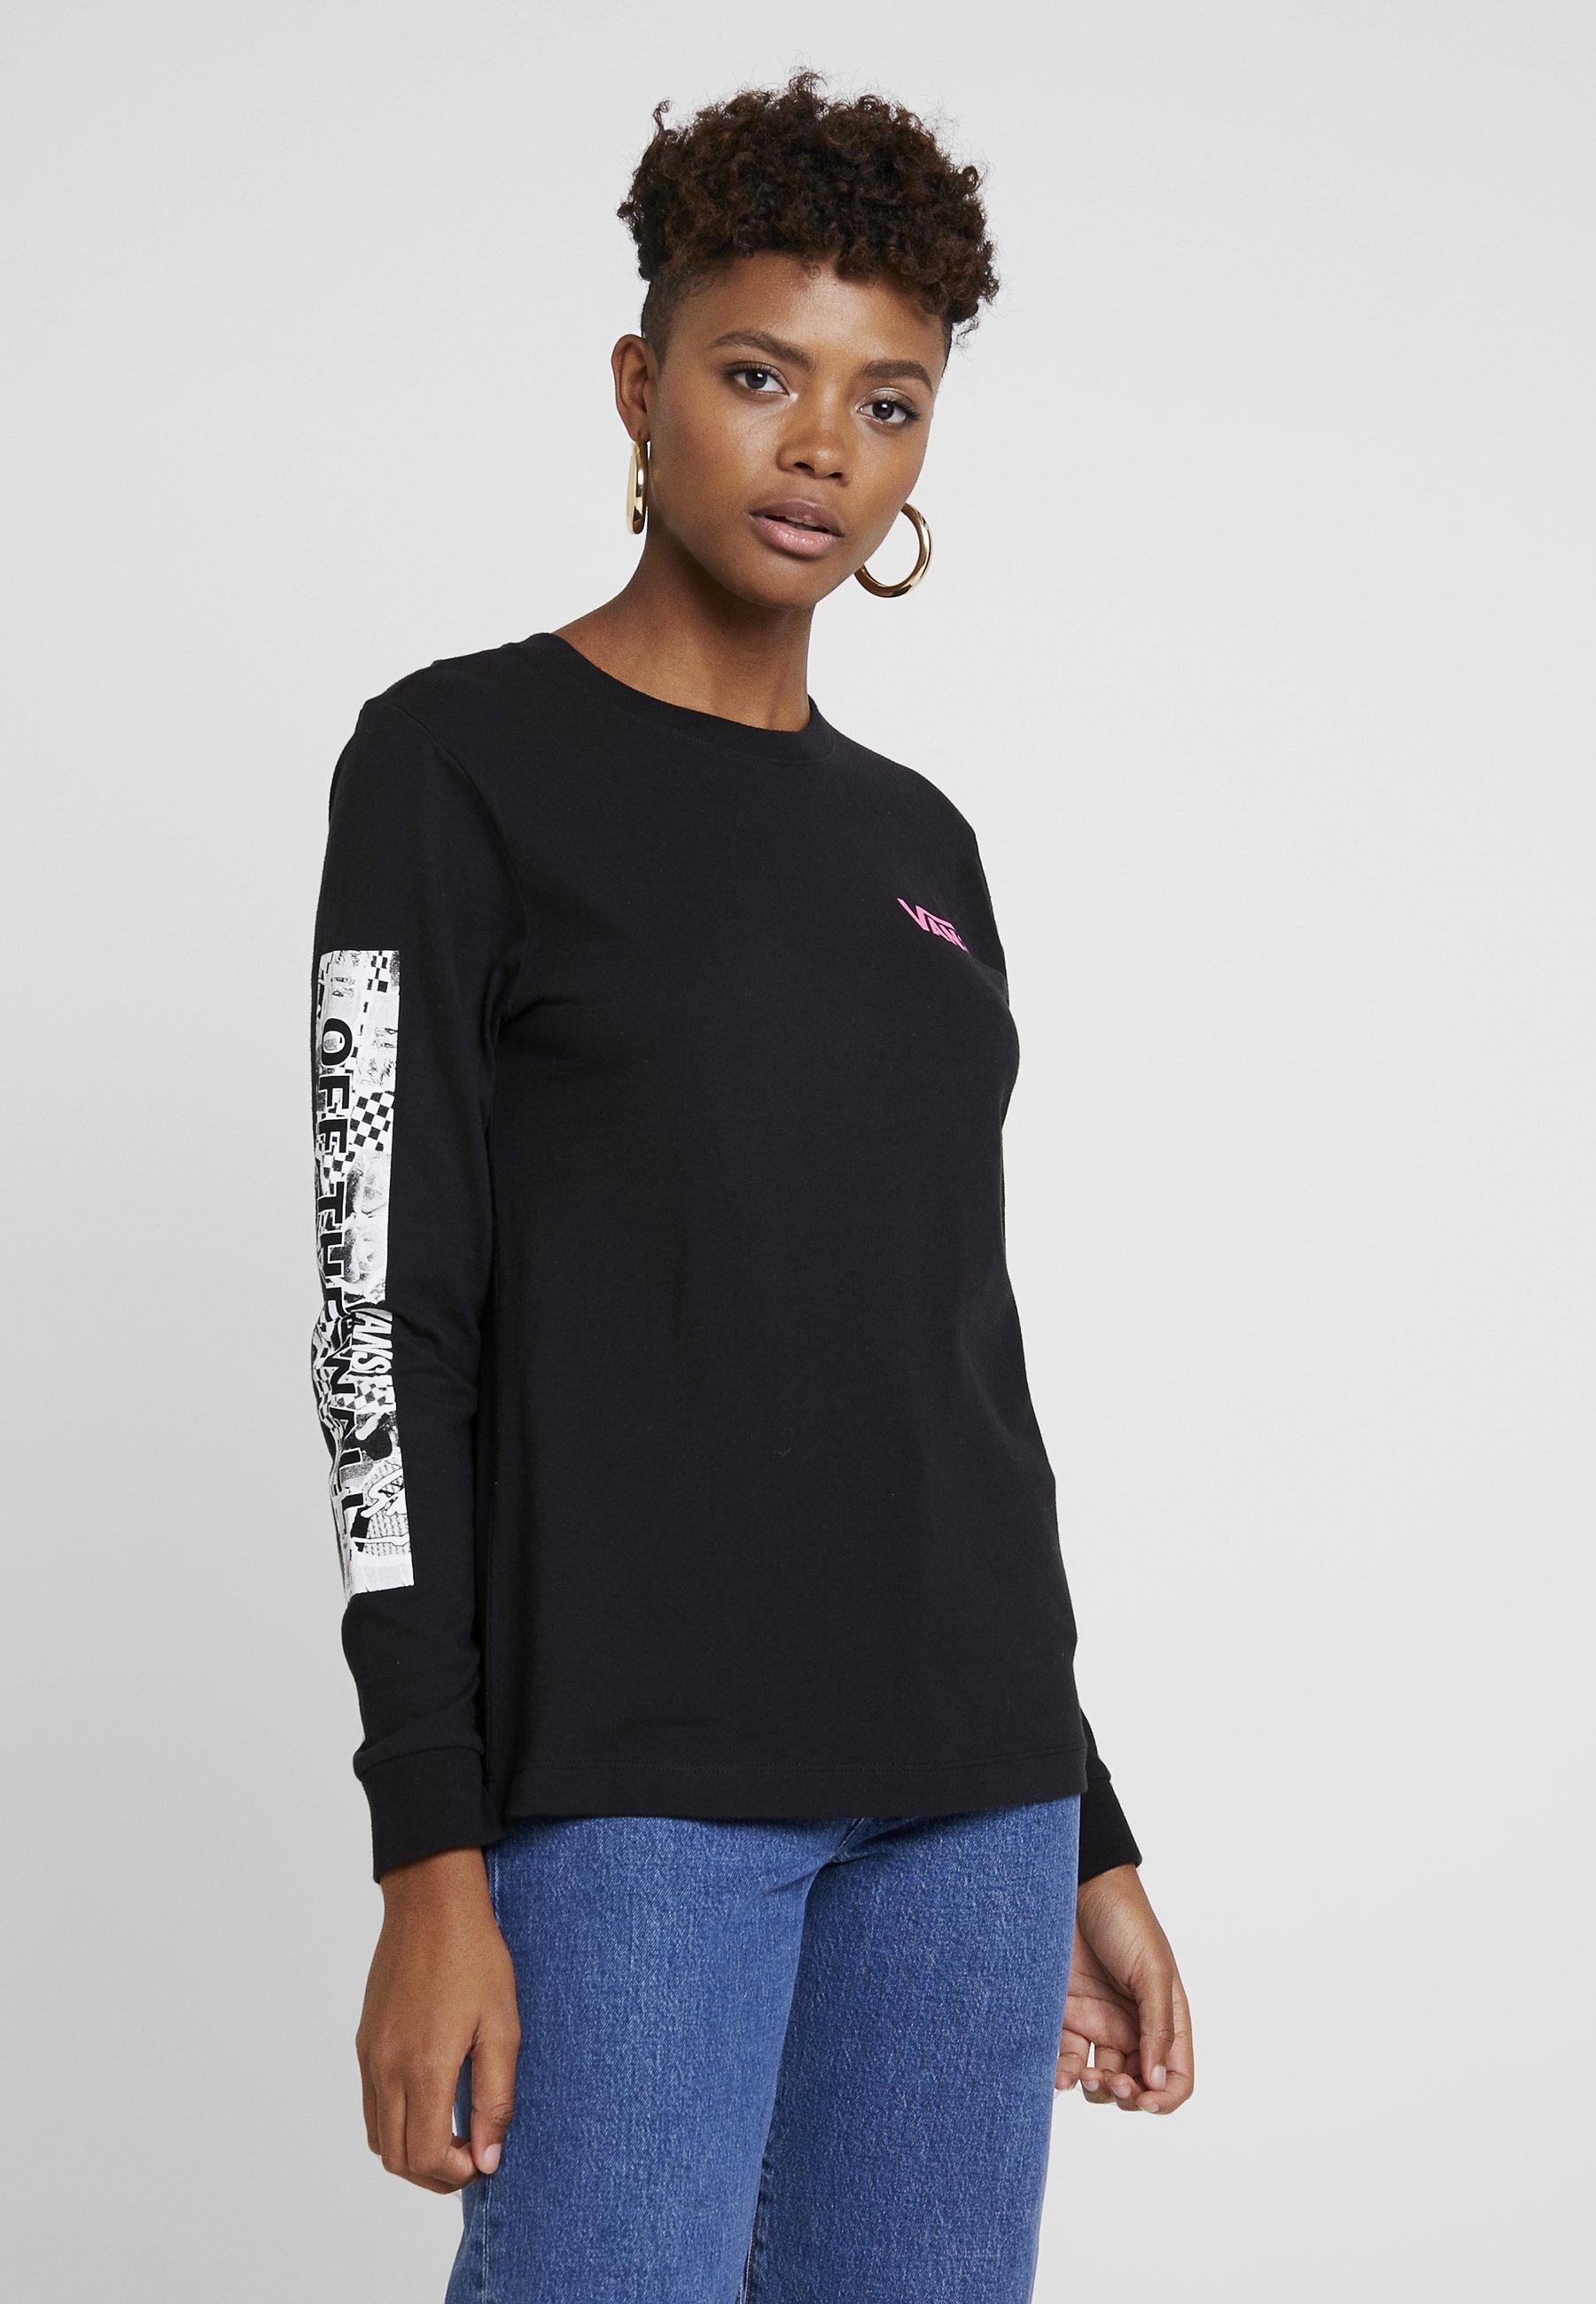 Black Vans À Lady shirt RockinT Longues Block Manches EHIeWD2Y9